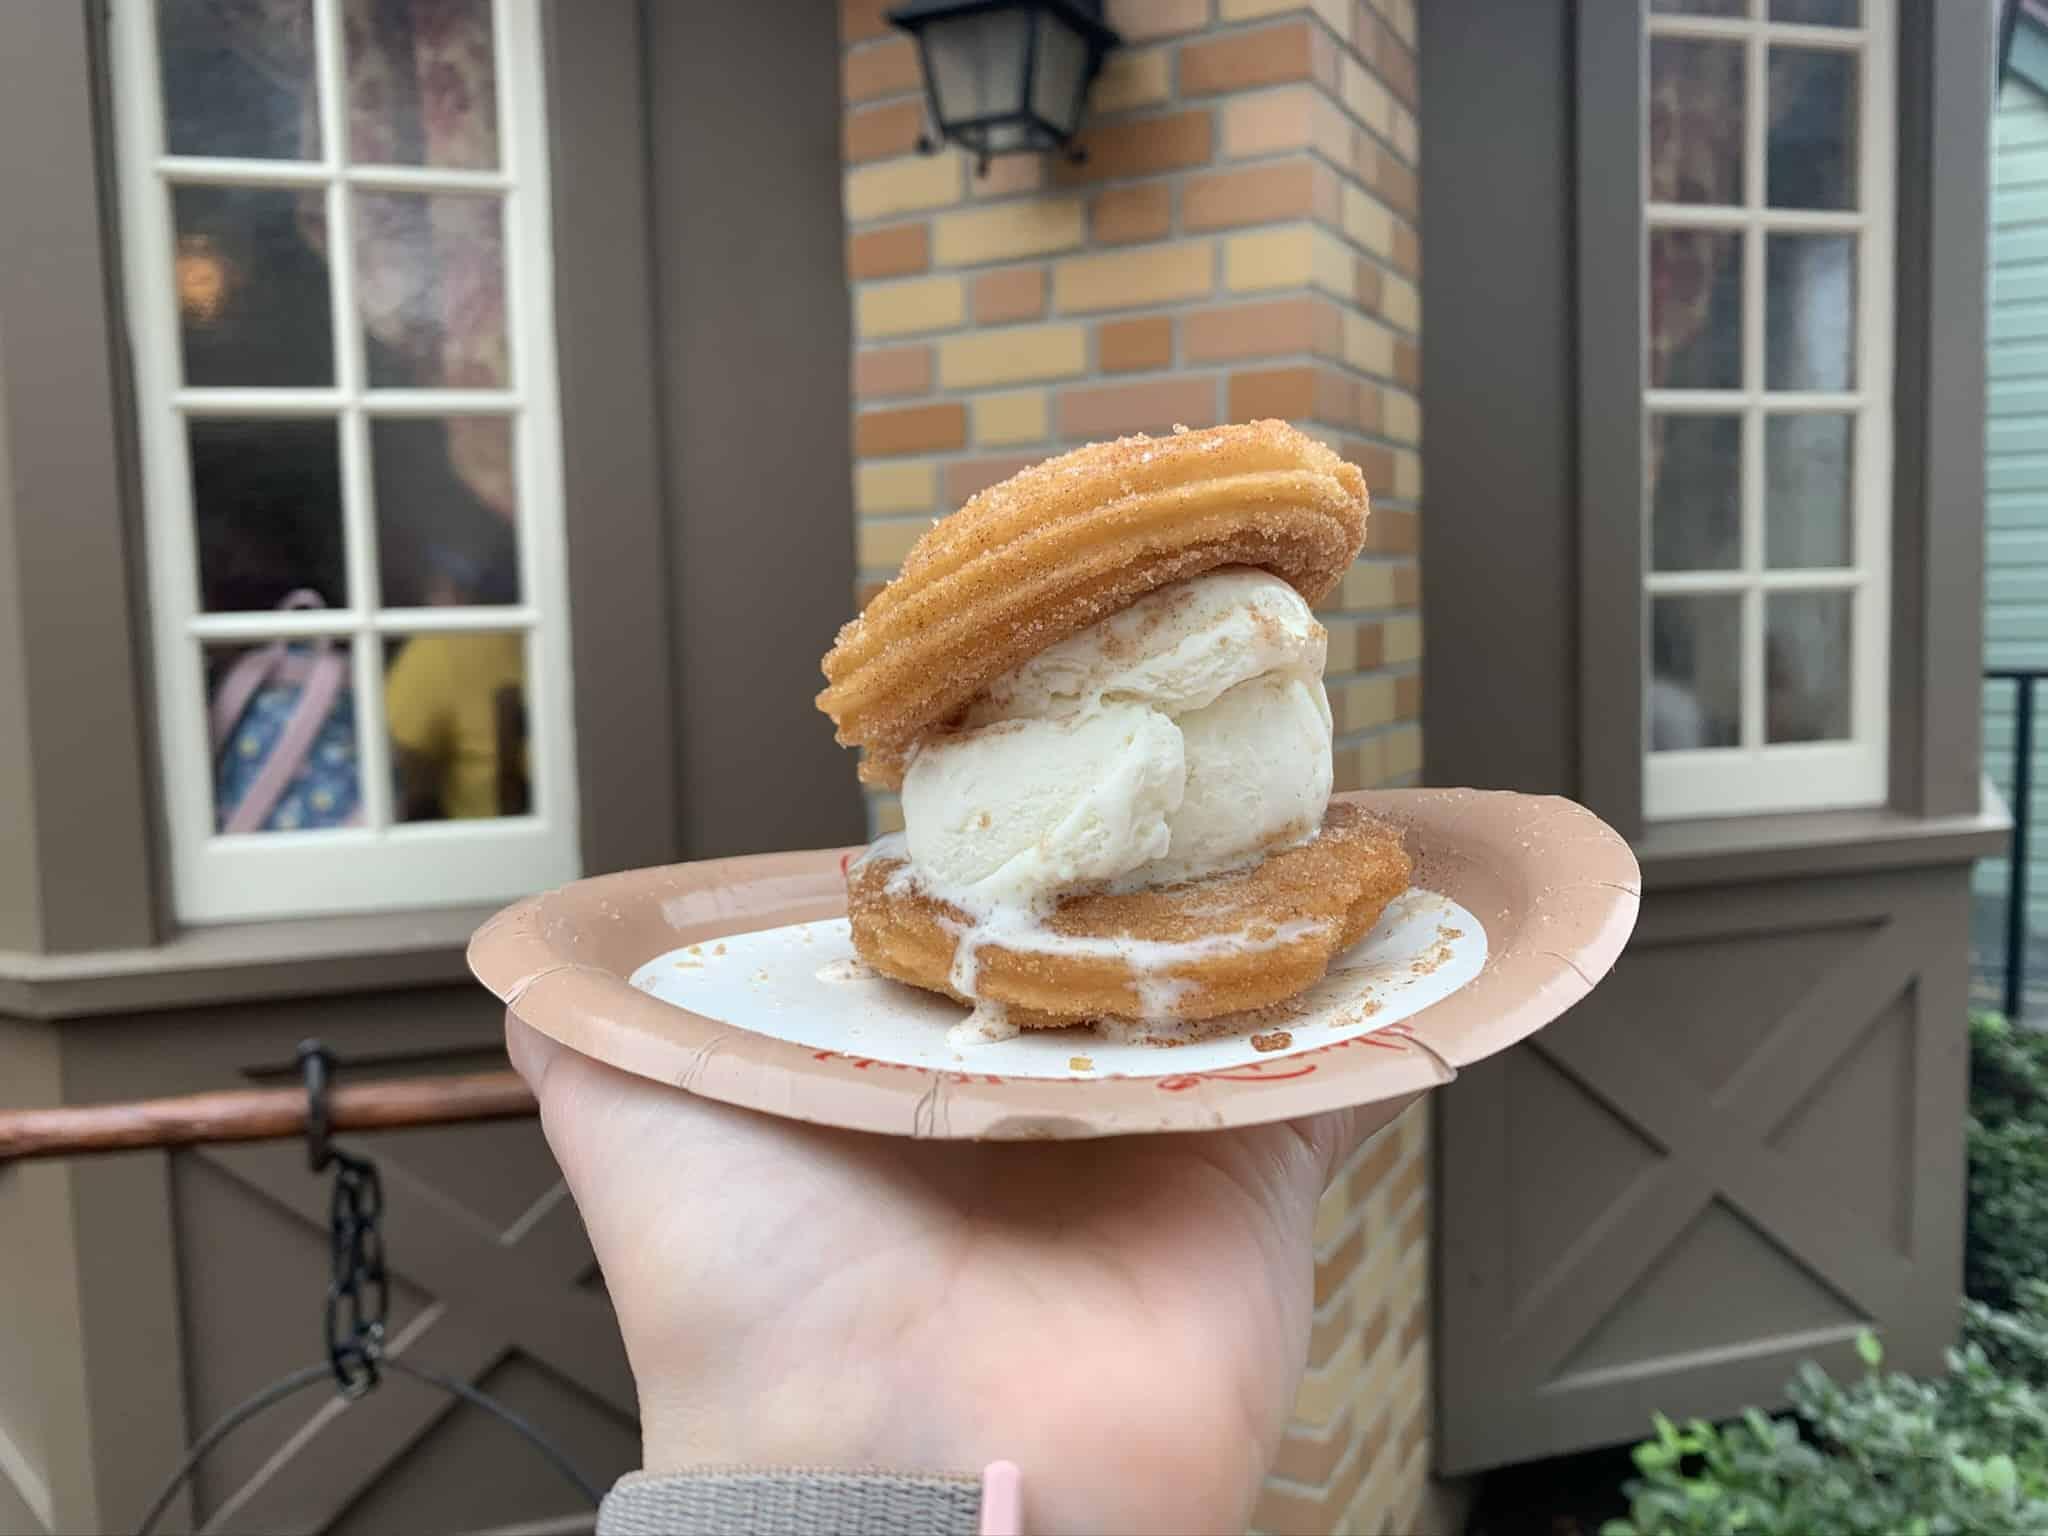 Disney churro ice cream sandwich on a paper plate